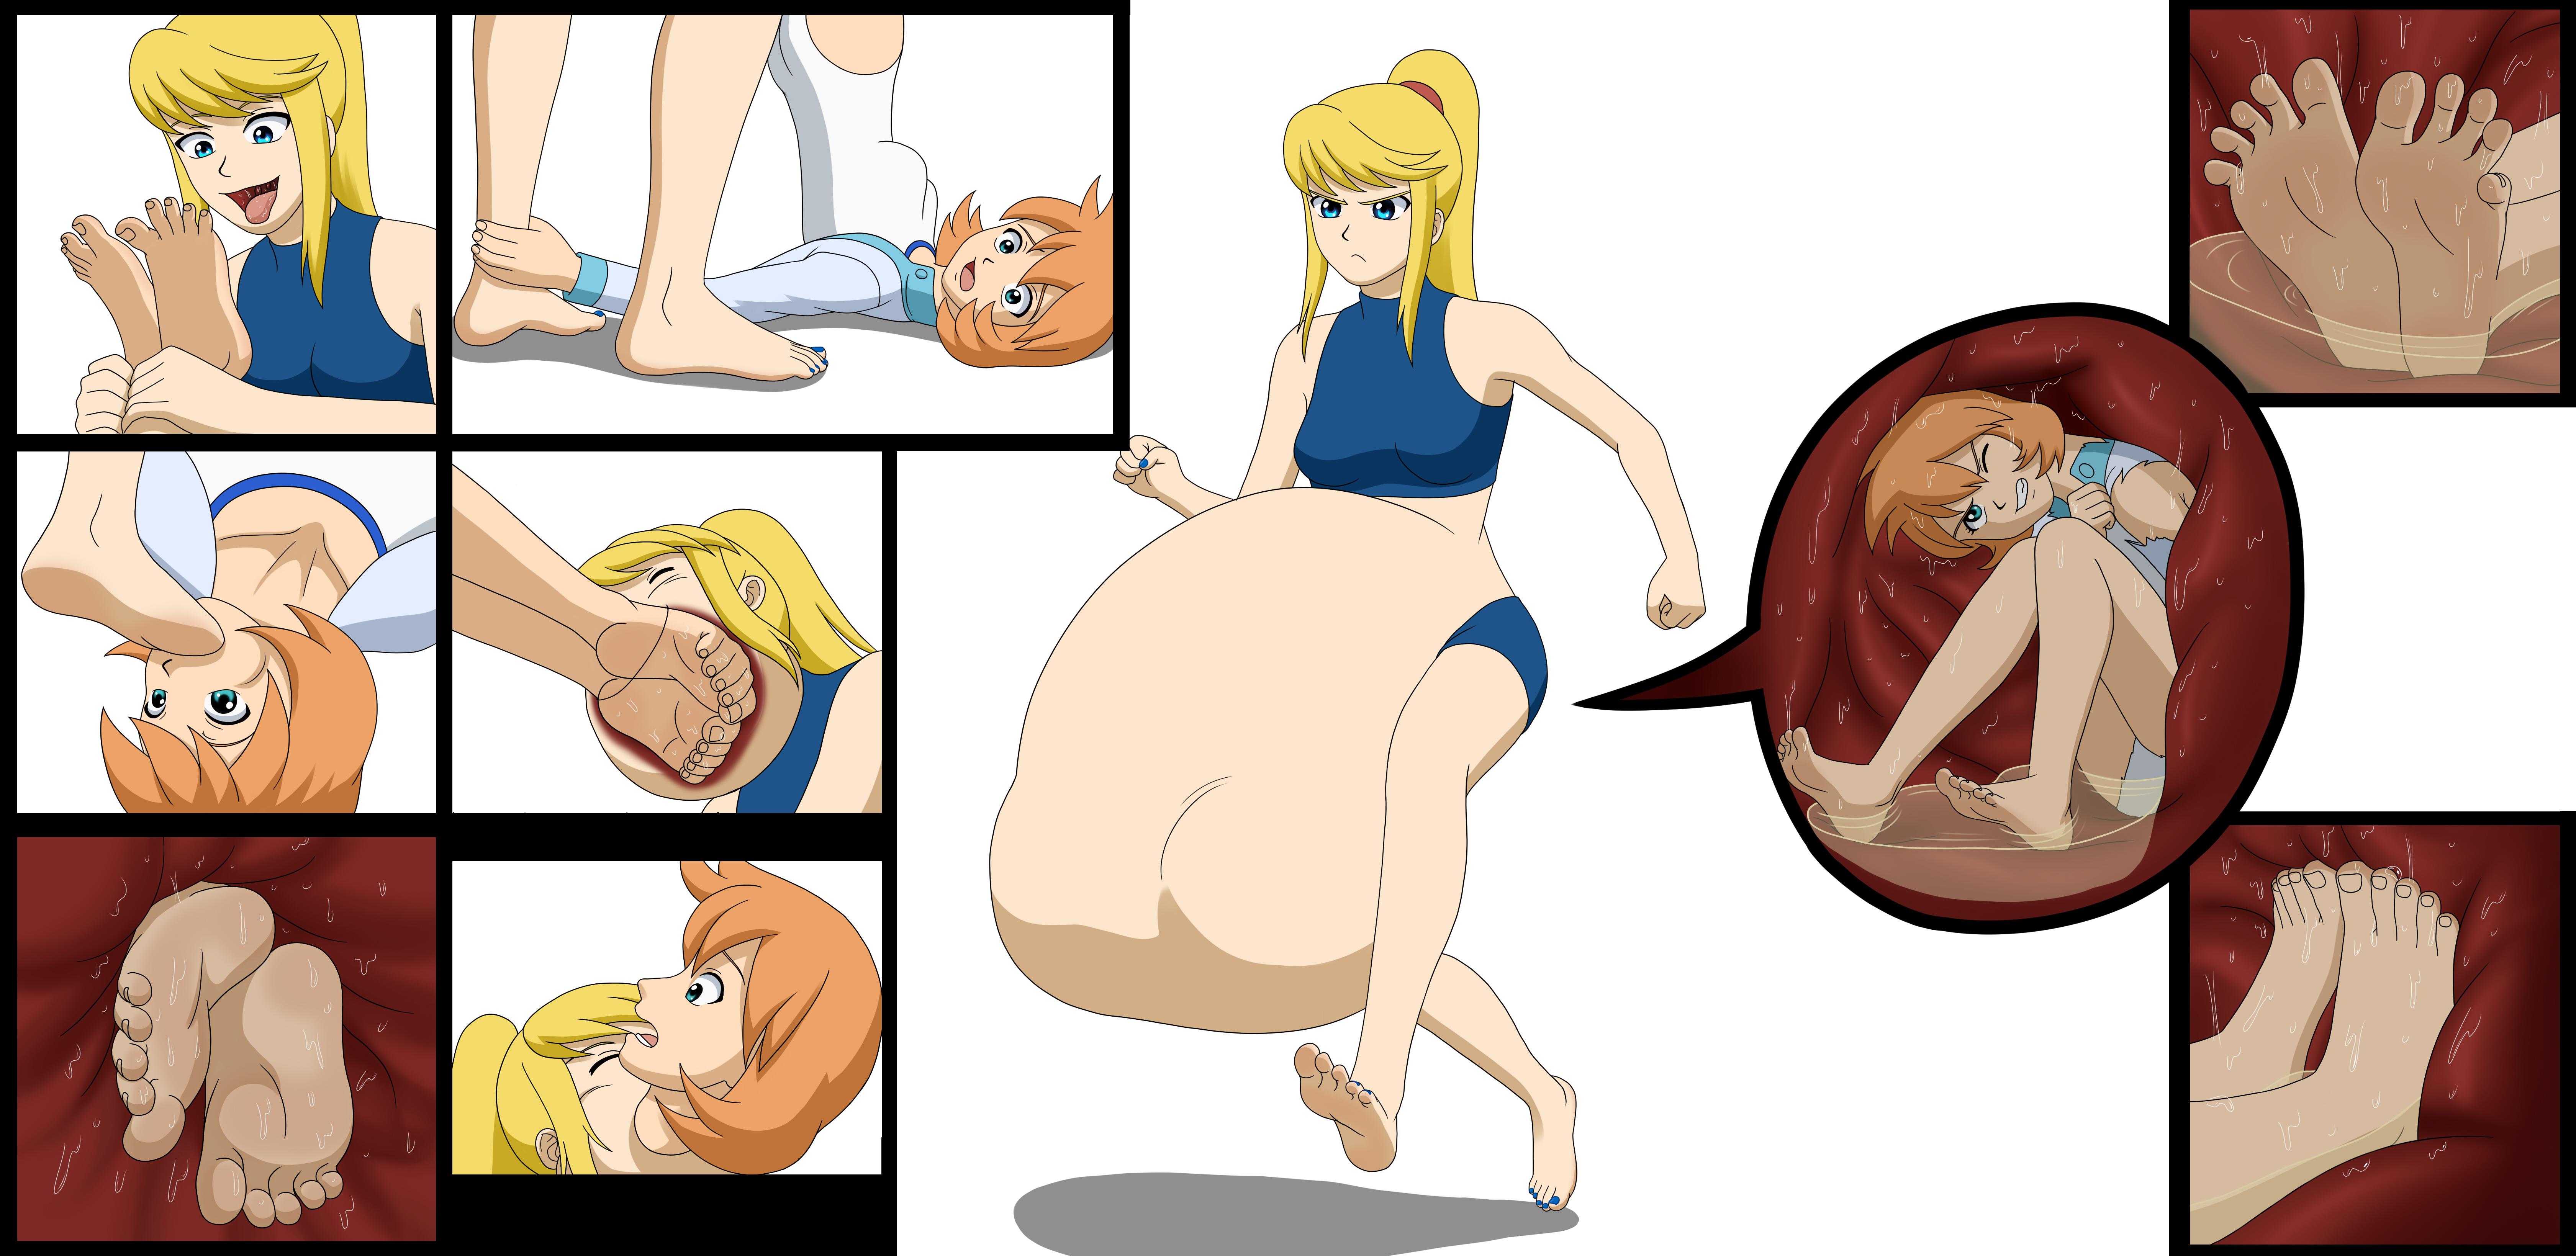 Megaman zx advent hentai